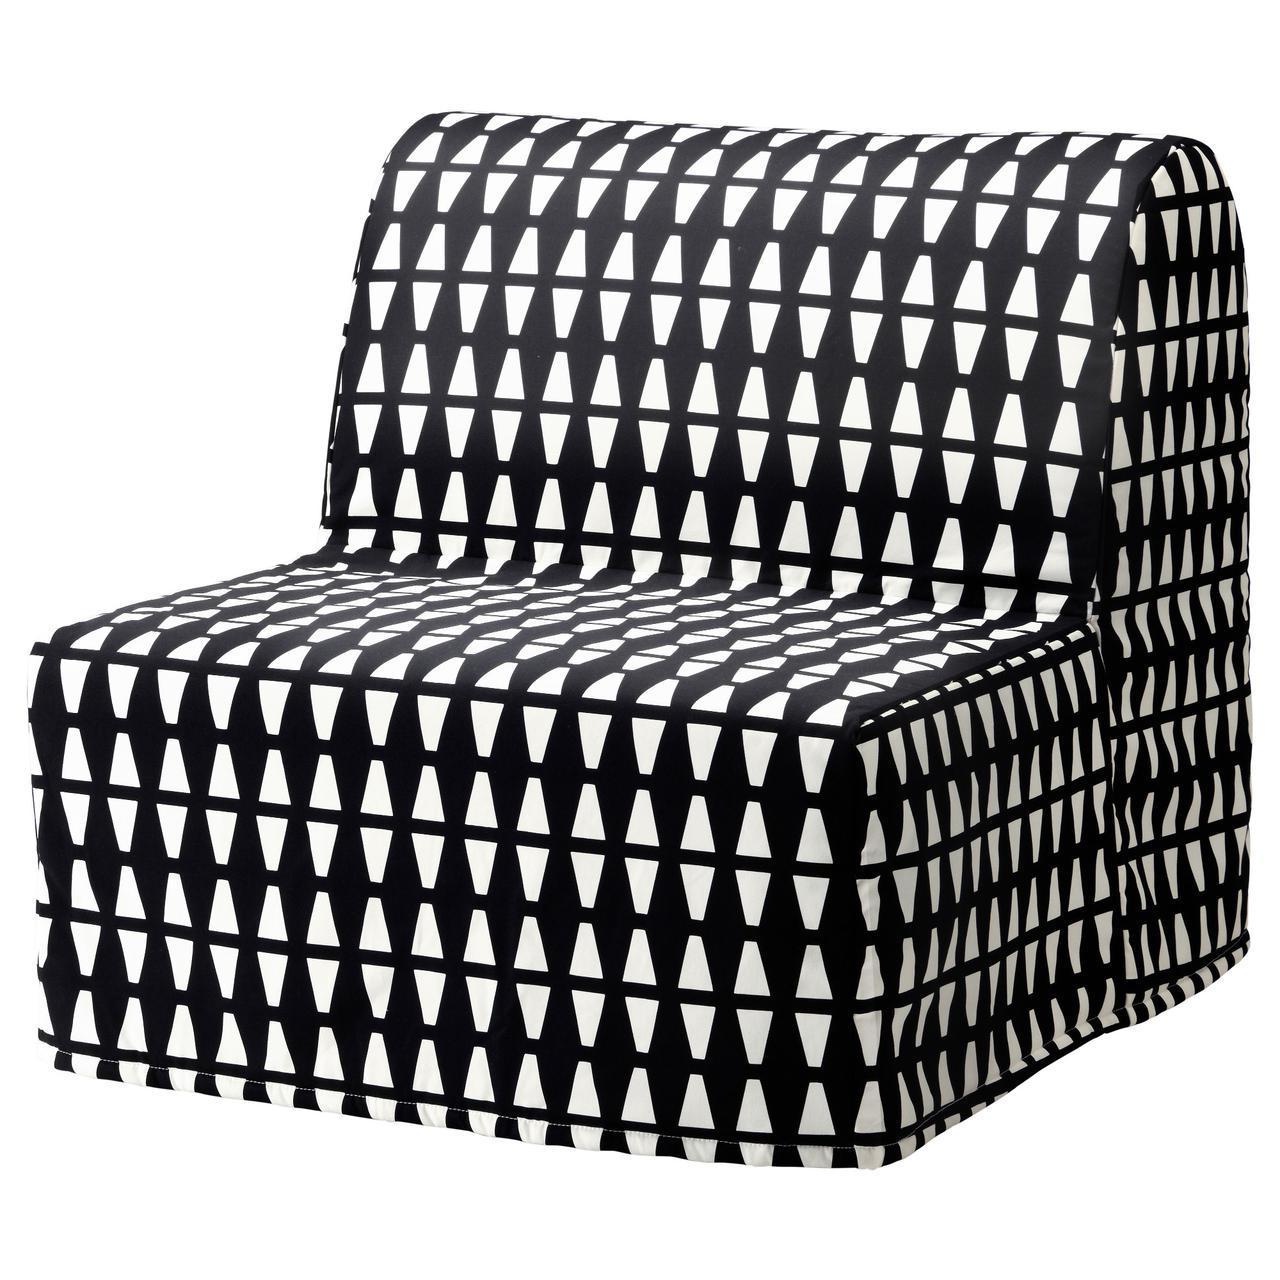 ✅ IKEA LYCKSELE LOVAS (991.341.52) Складной стул, Ebbarp черный/белый